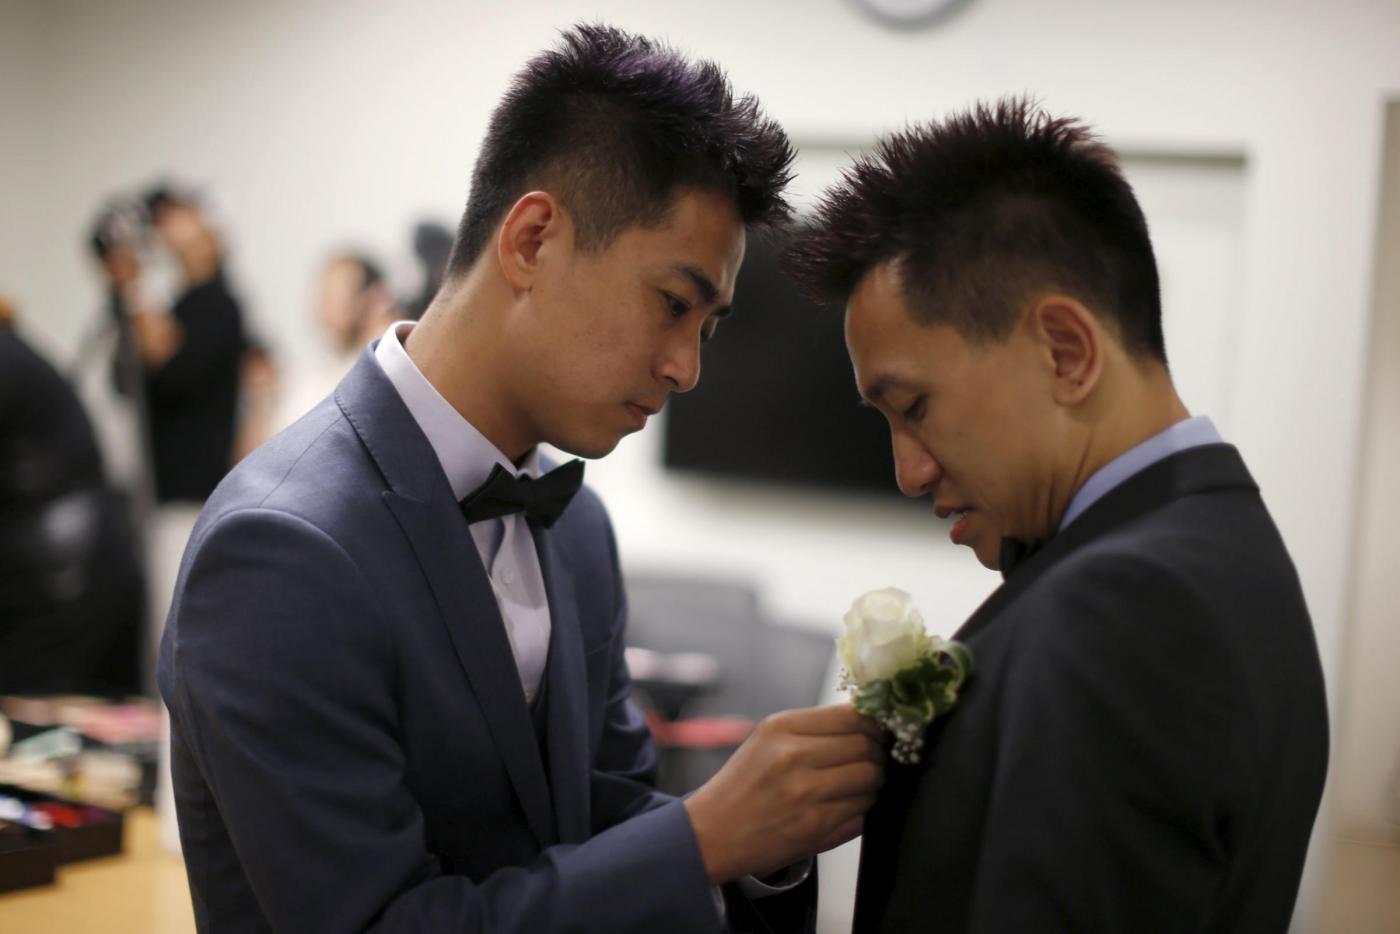 Sette coppie omosessuali cinesi si sposano a Los Angeles07